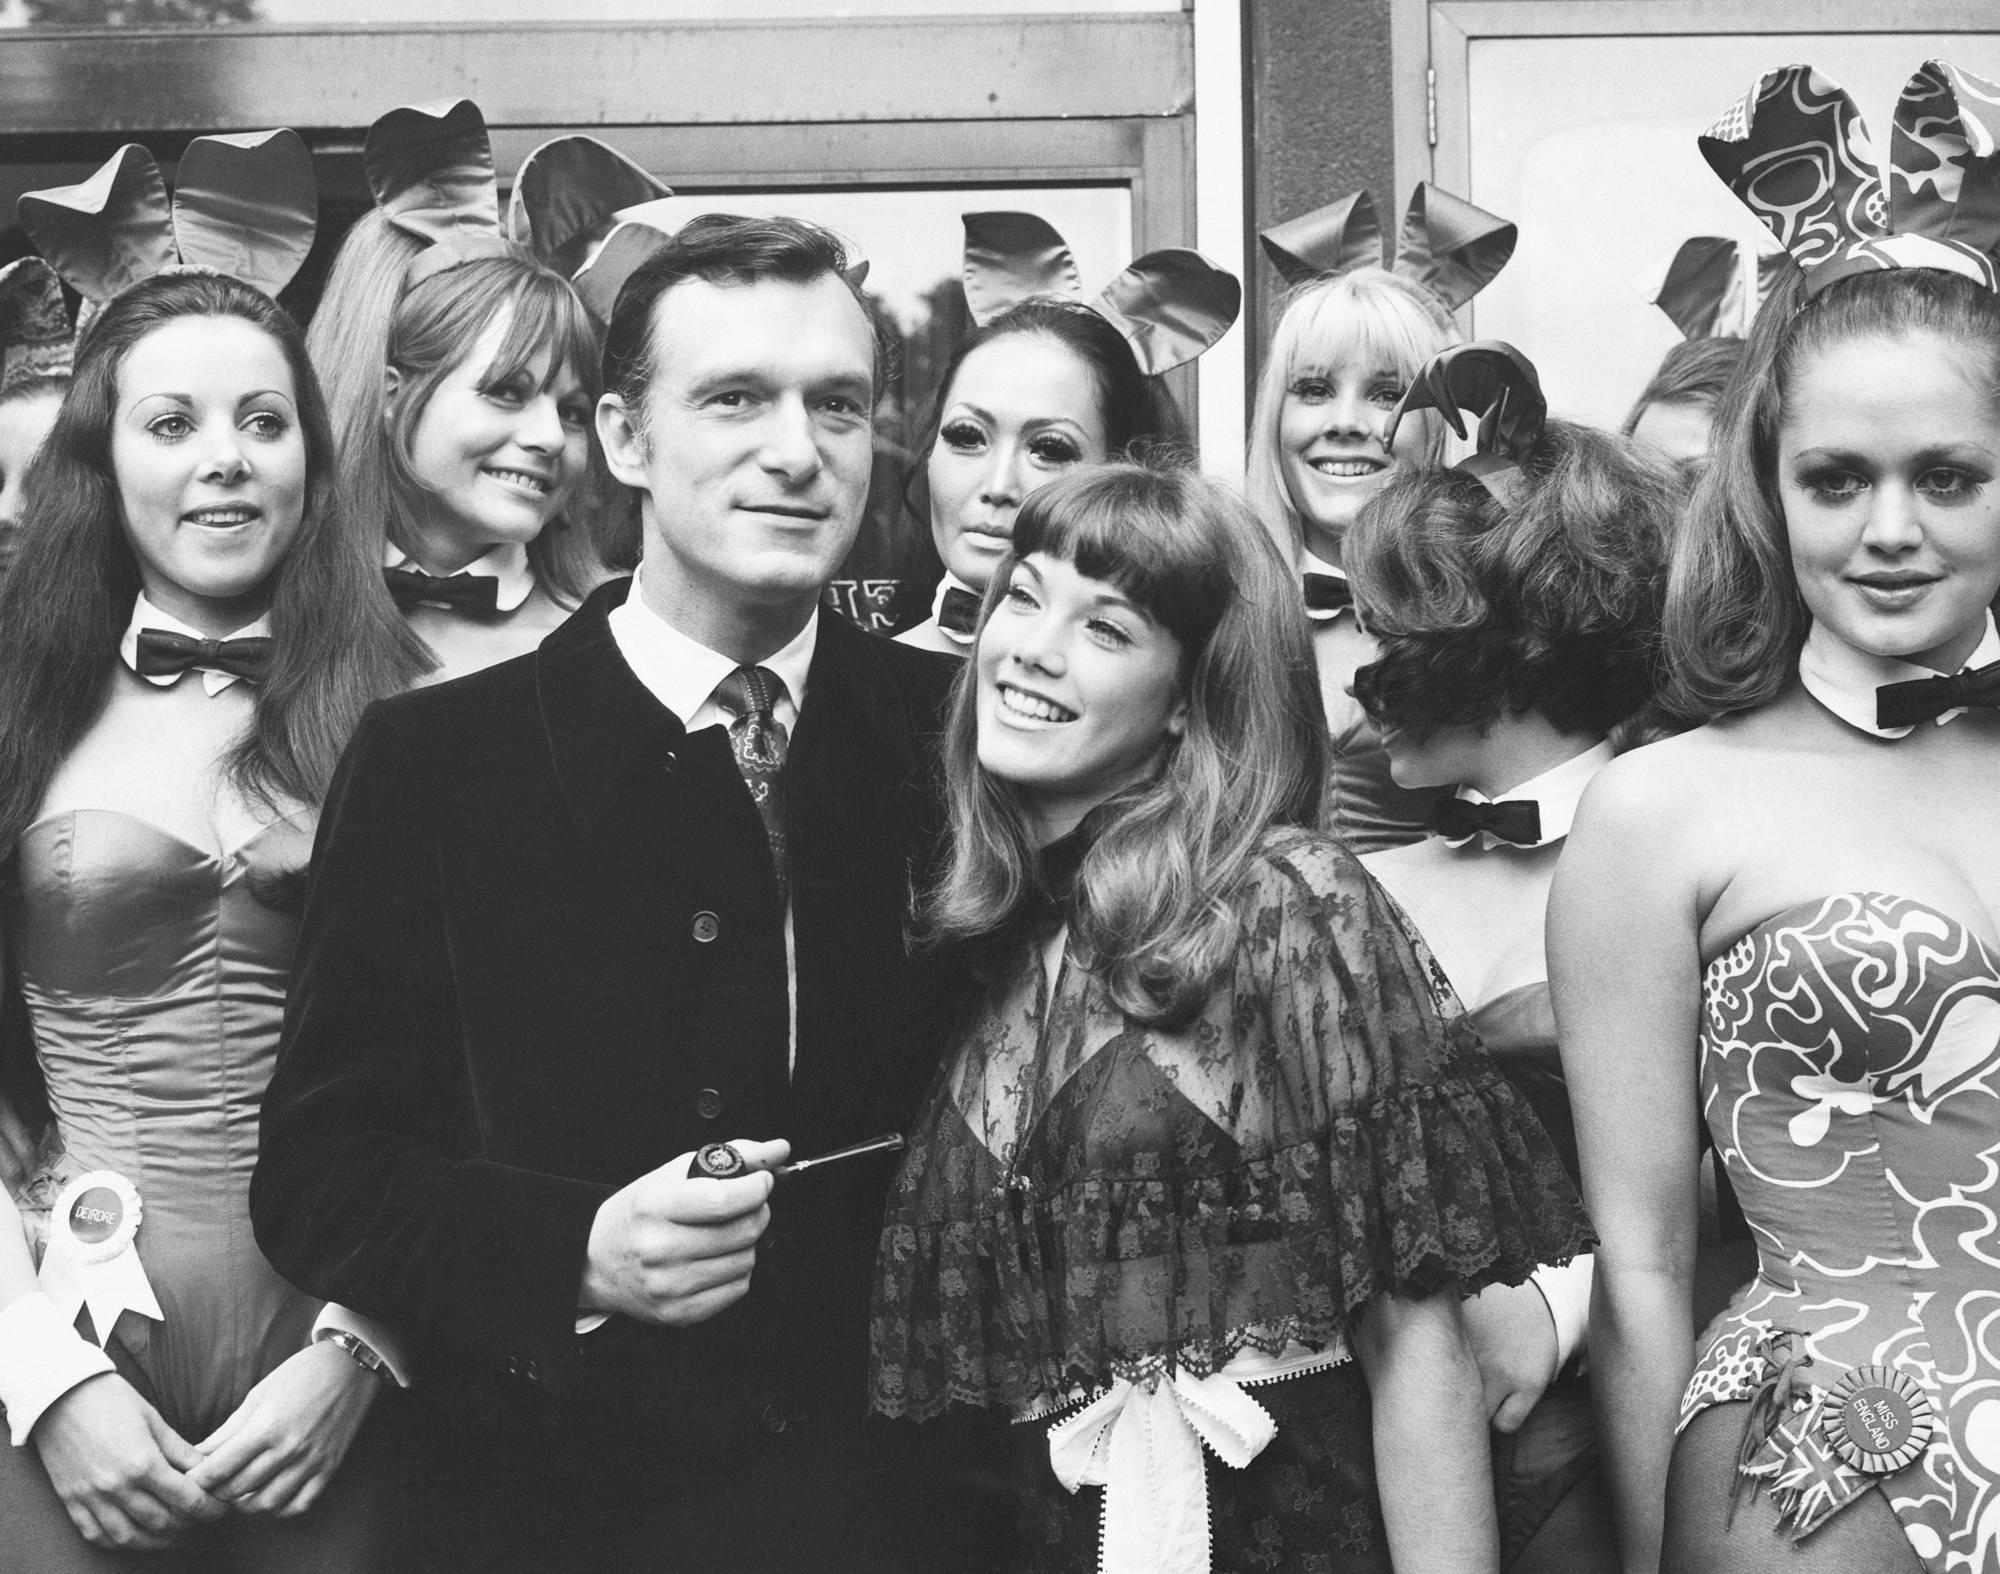 Hugh Hefner and his girlfriend Barbi Benton visit his Playboy Club in London. (Photo by © Hulton-Deutsch Collection/CORBIS/Corbis via Getty Images)